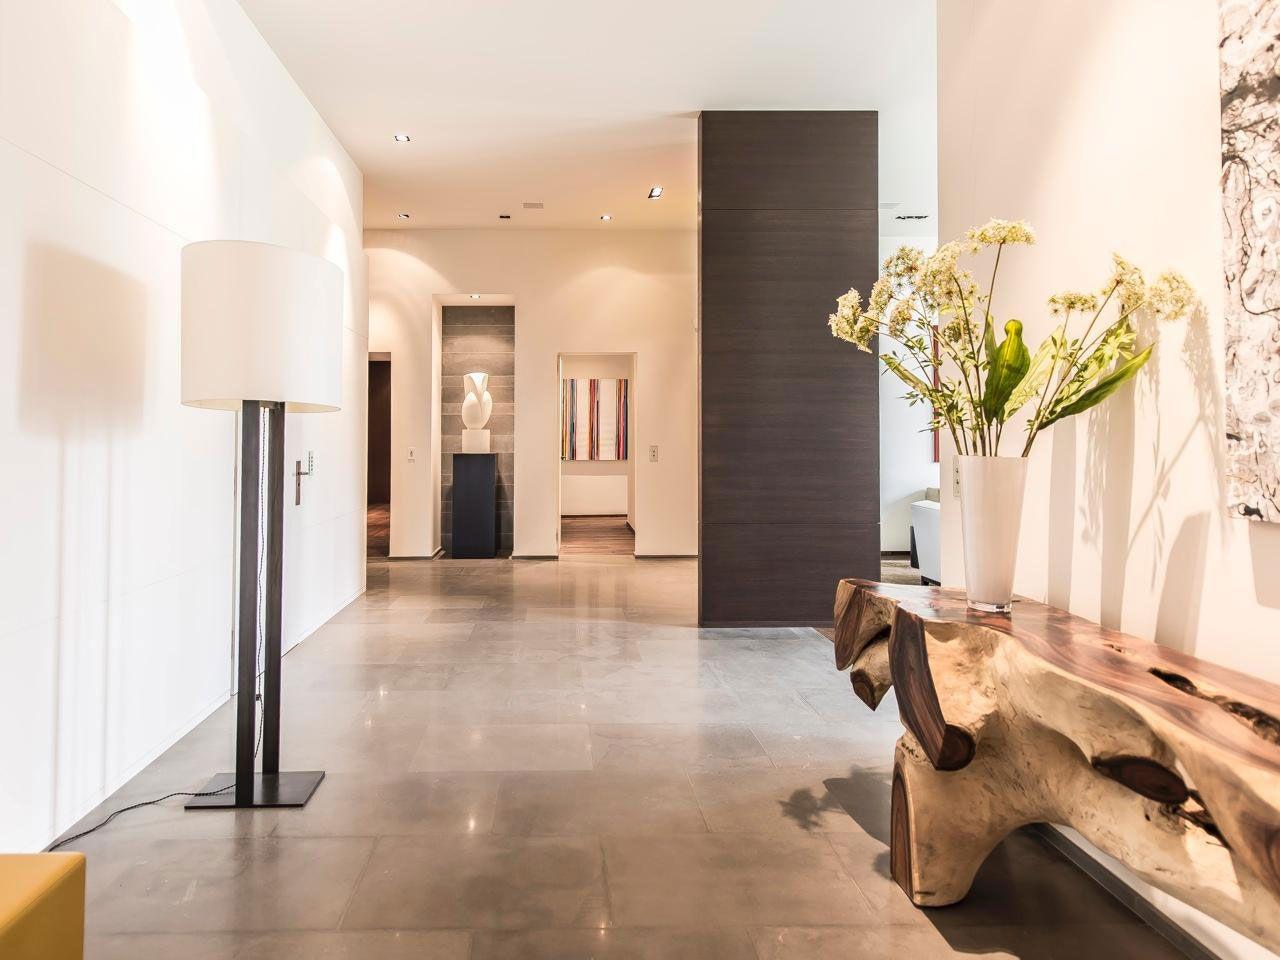 Chic Elegant Apartment in Brussels With Bright Interiors-04